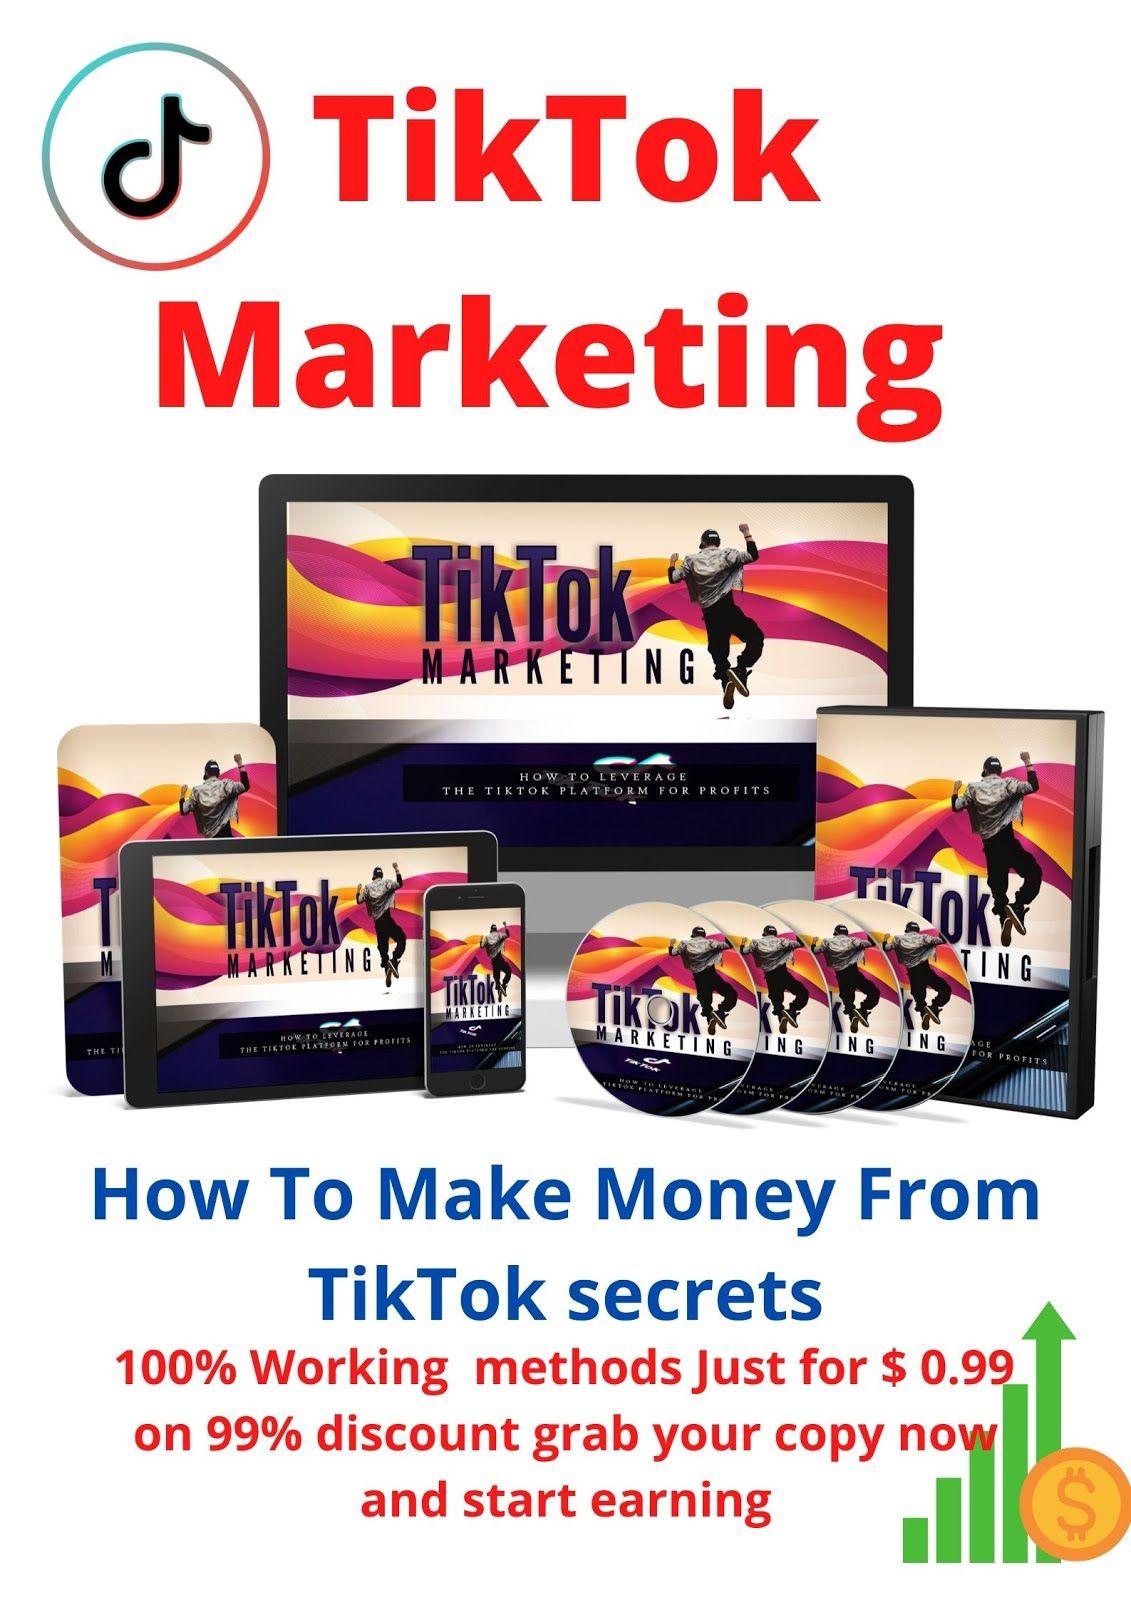 Tiktok Marketing Guide Pdf Earn Money From Tiktok Free Shipping Bikini Photoshoot India Westbrooks Bikinis